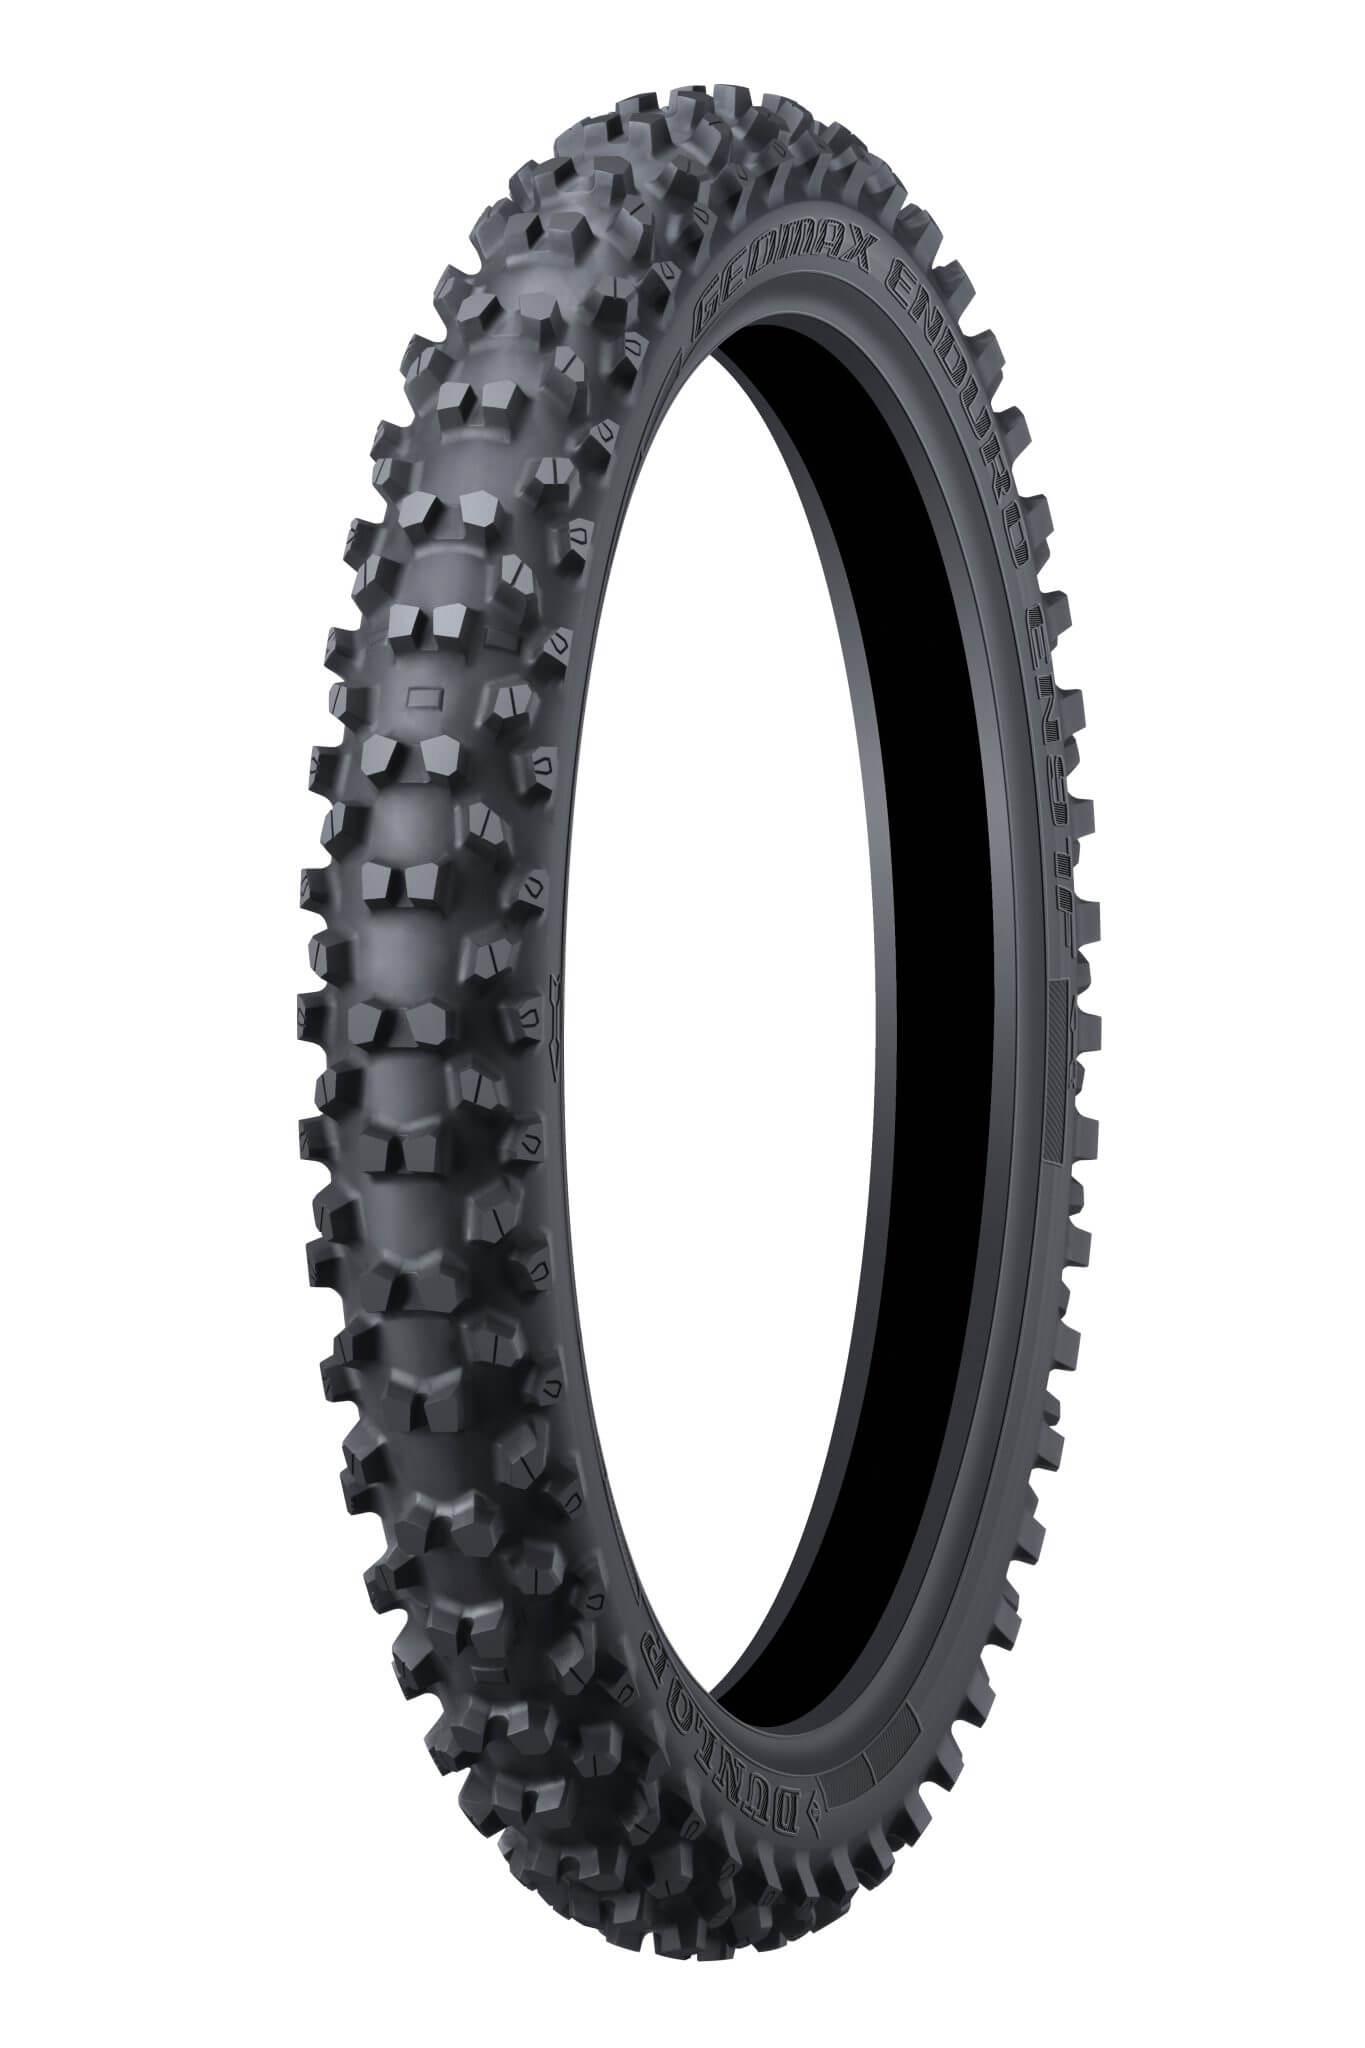 Dunlop Geomax EN91 90/90-21 54R Front Tyre